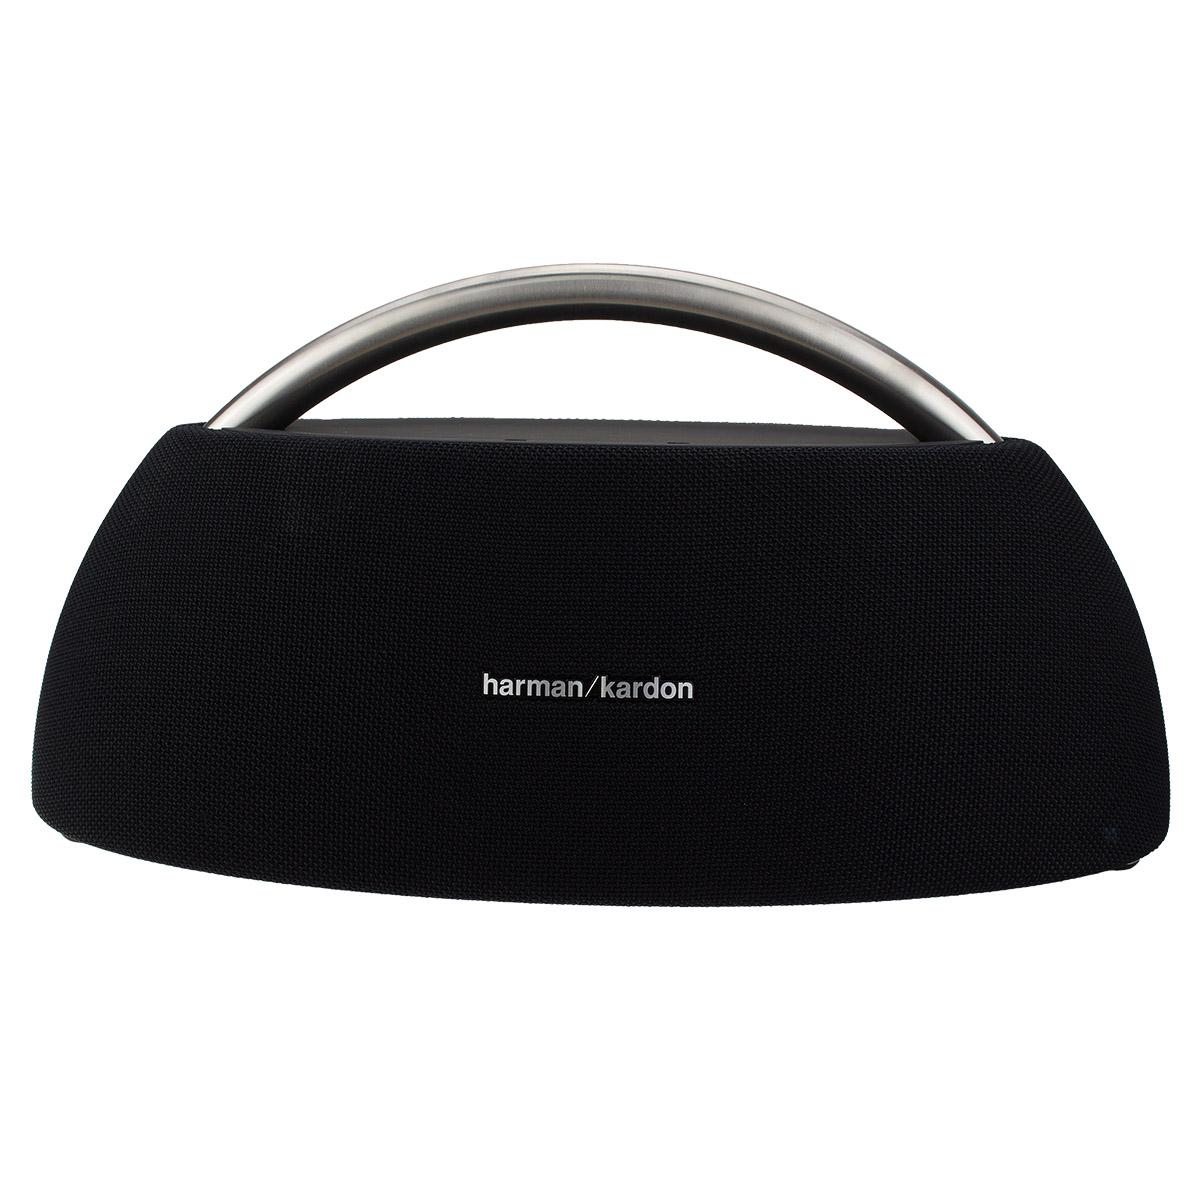 harman/kardon GO + PLAY - Lautsprecher - tragbar - kabellos - Bluetooth - 100 Watt - zweiweg - Schwarz